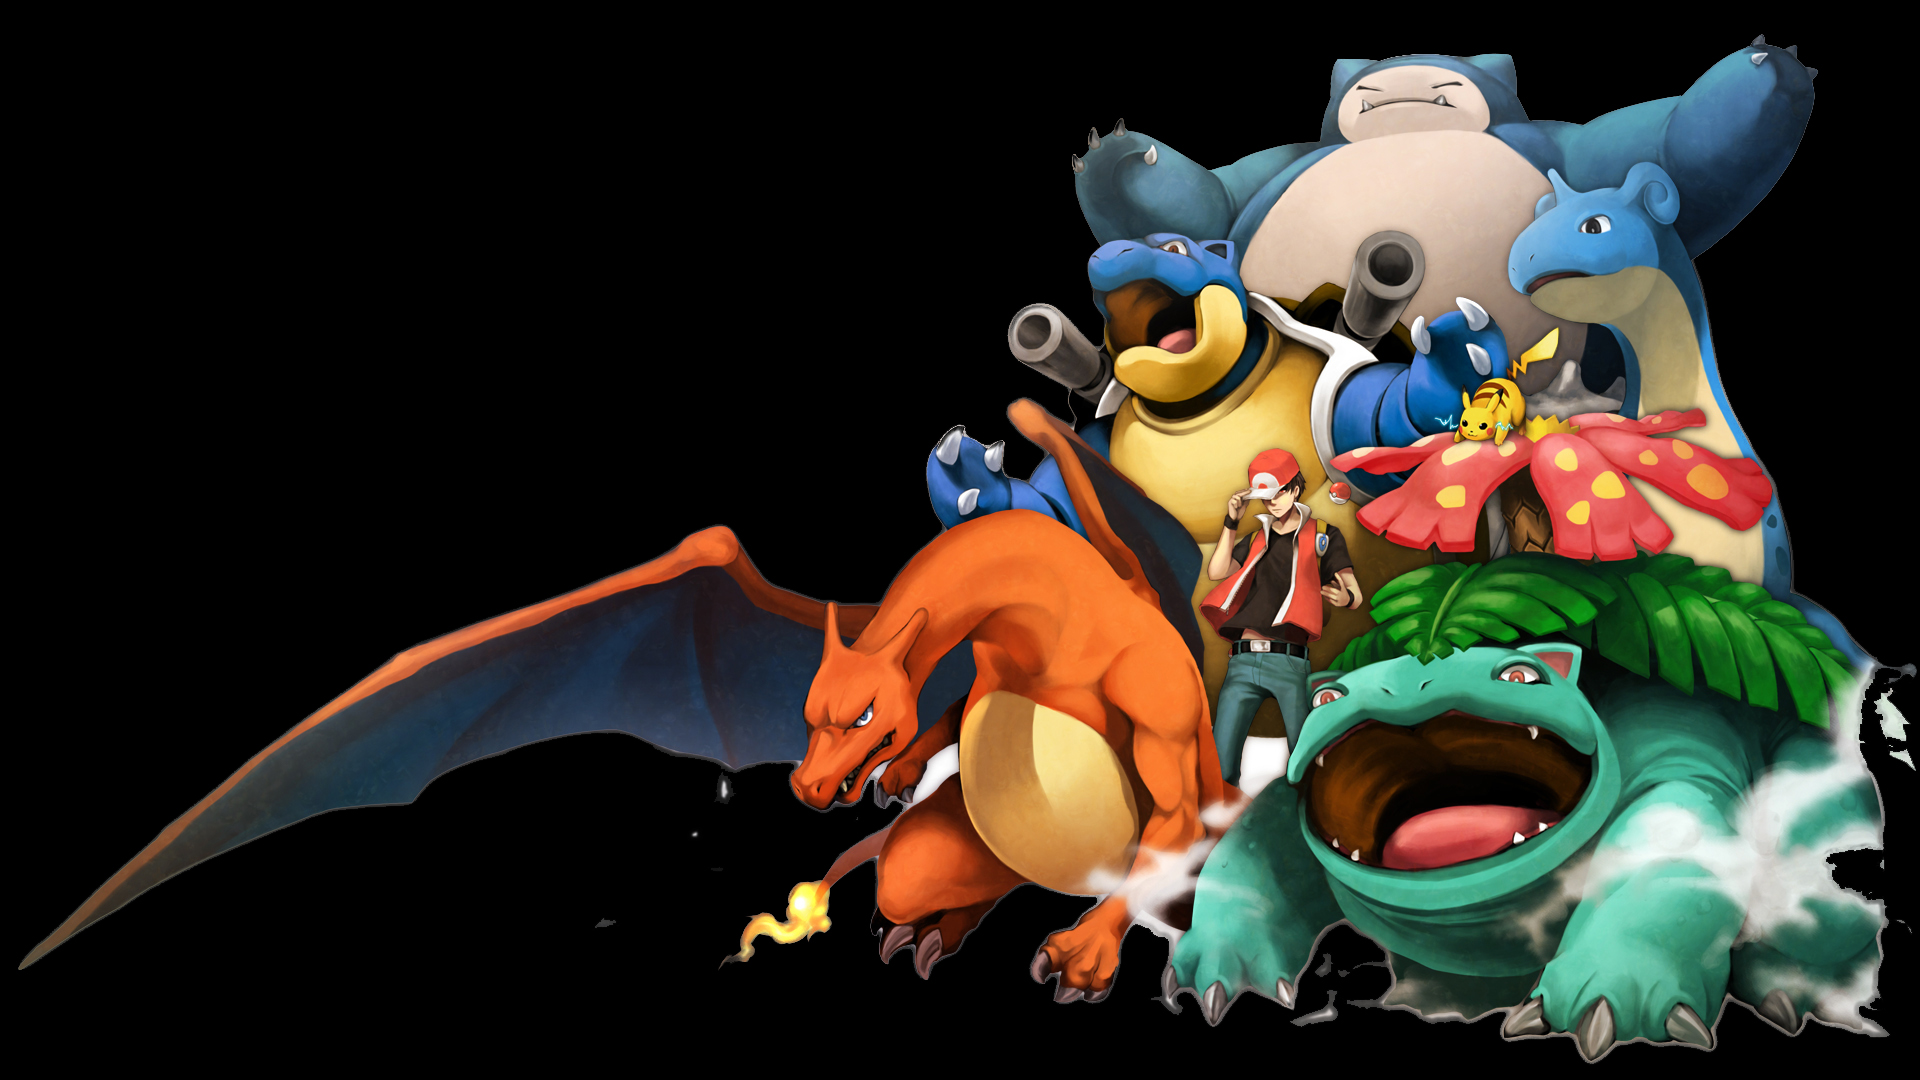 25 Cool Pokemon Wallpapers HD 1920x1080